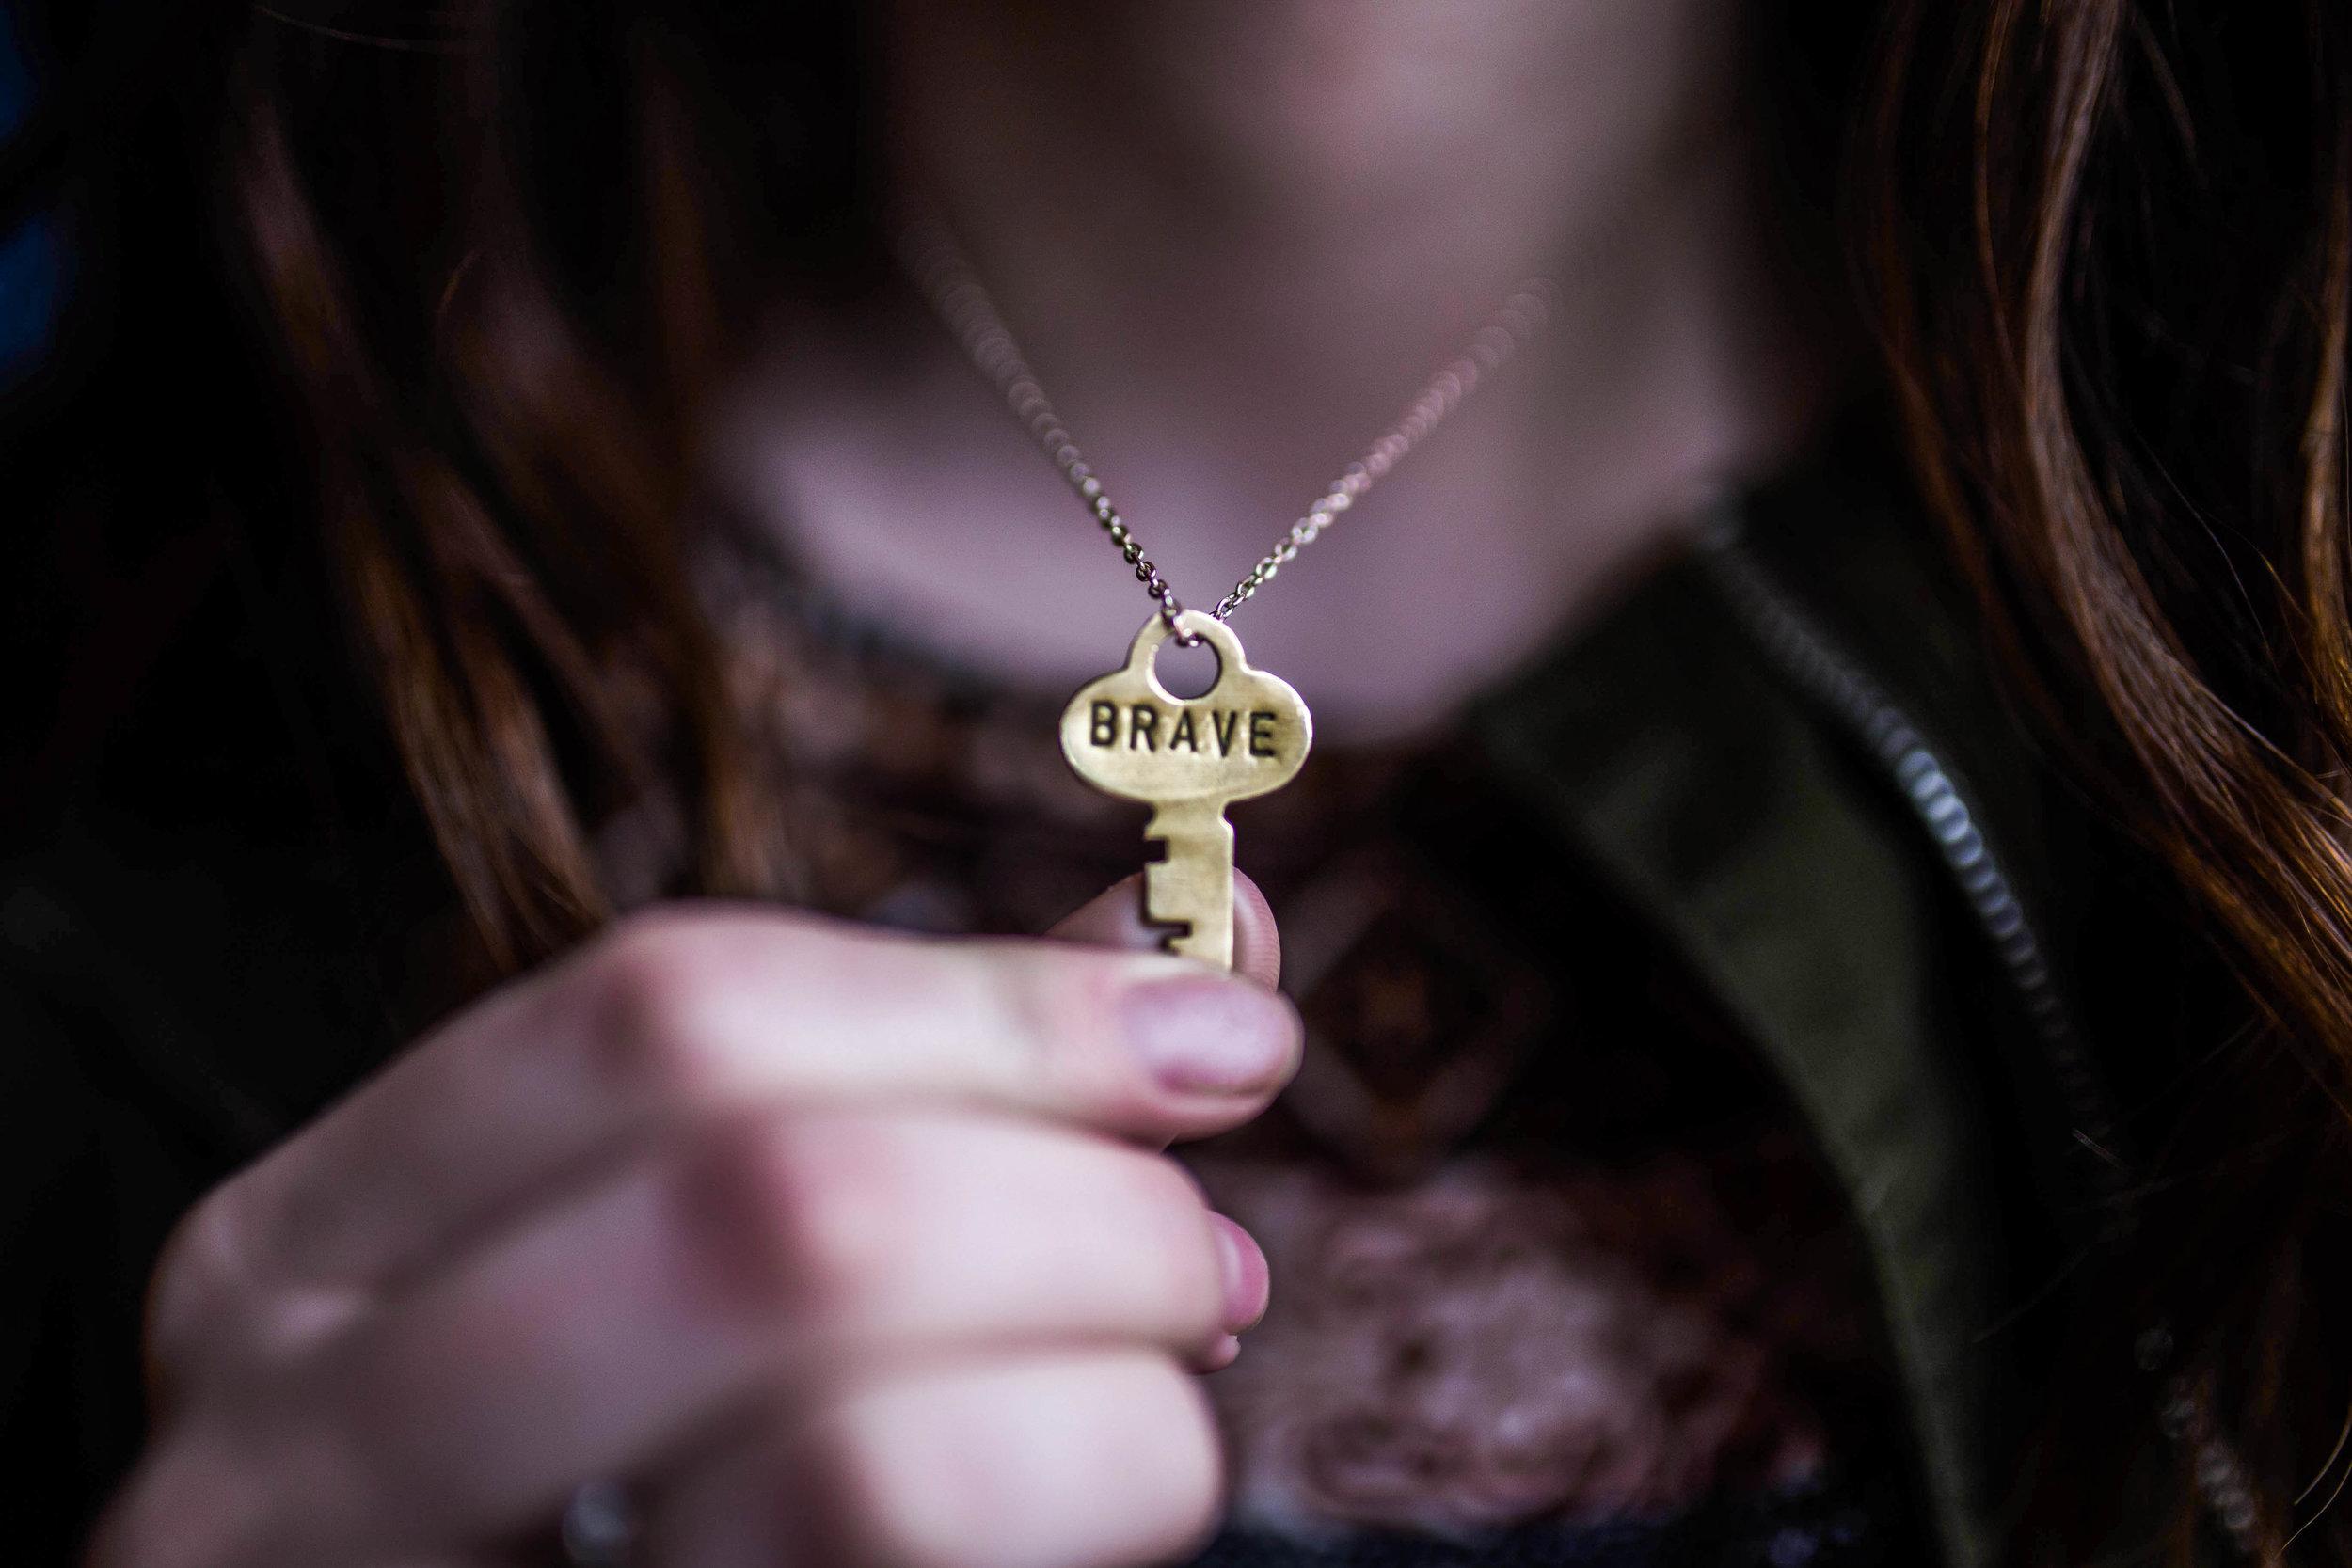 Brave | The Giving Keys